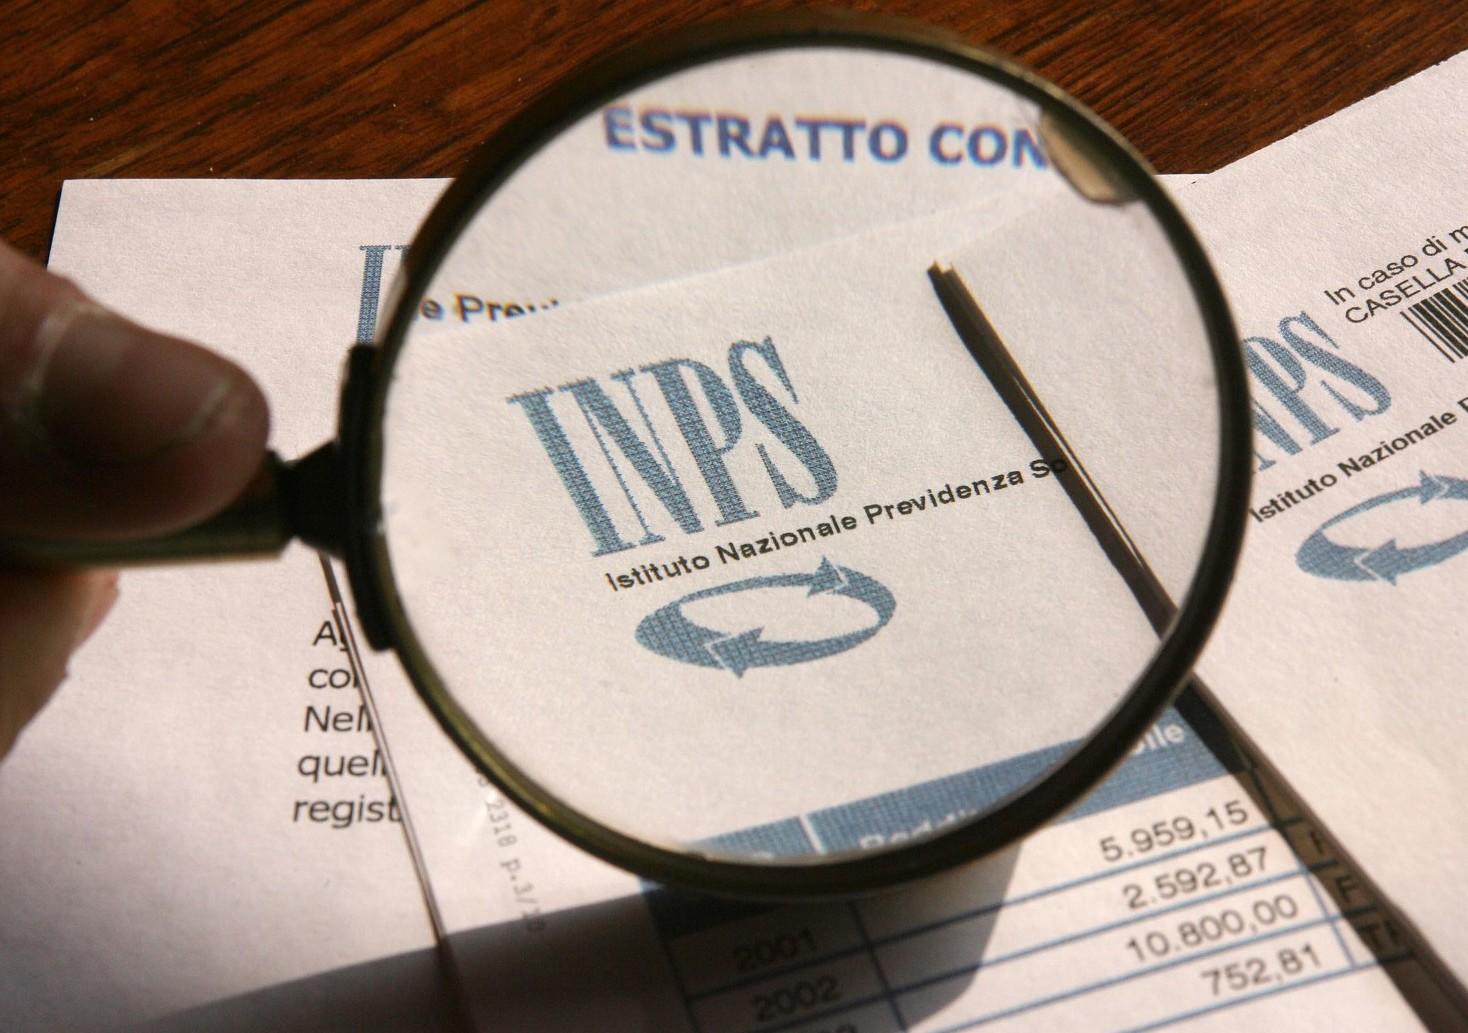 Pensione anticipata news: ultime notizie